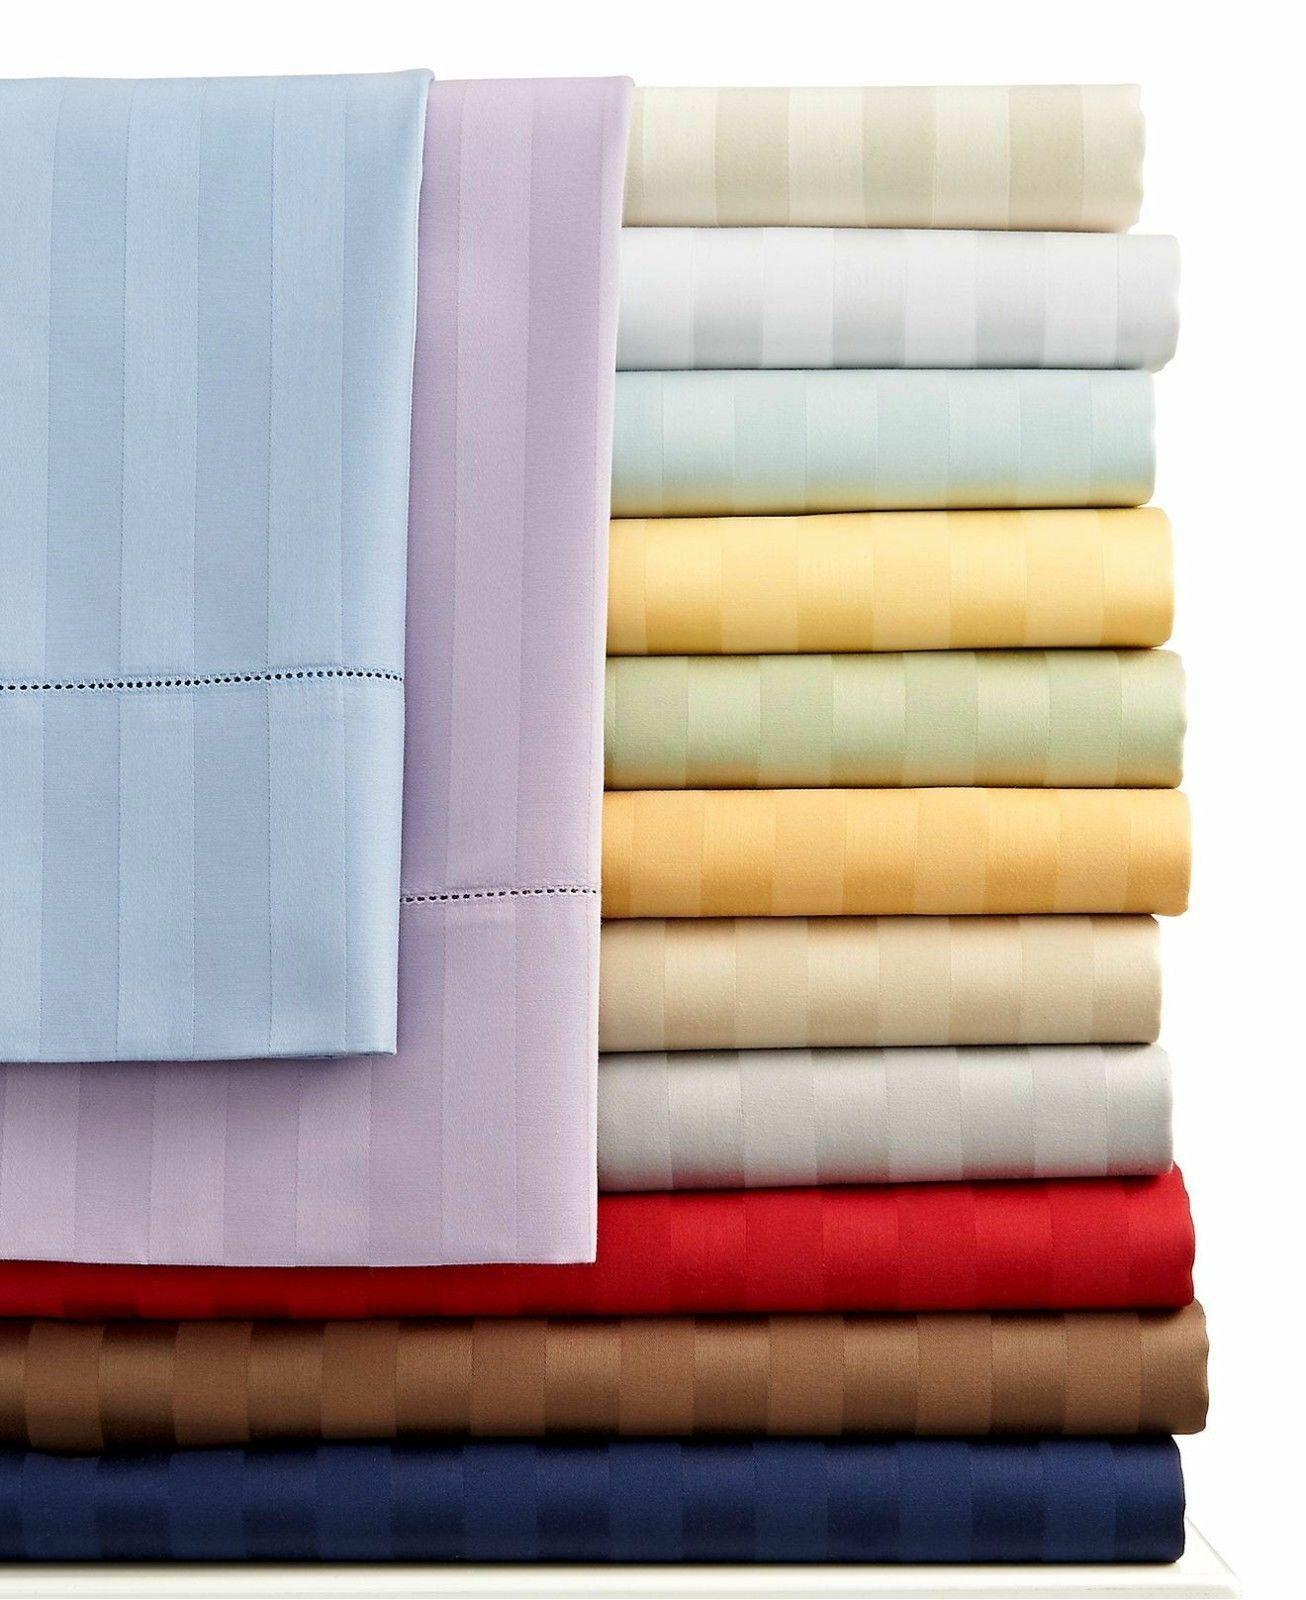 Comfort 5 PCs Duvet Set Fitted Sheet 100% Cotton Striped Farbes UK Super King